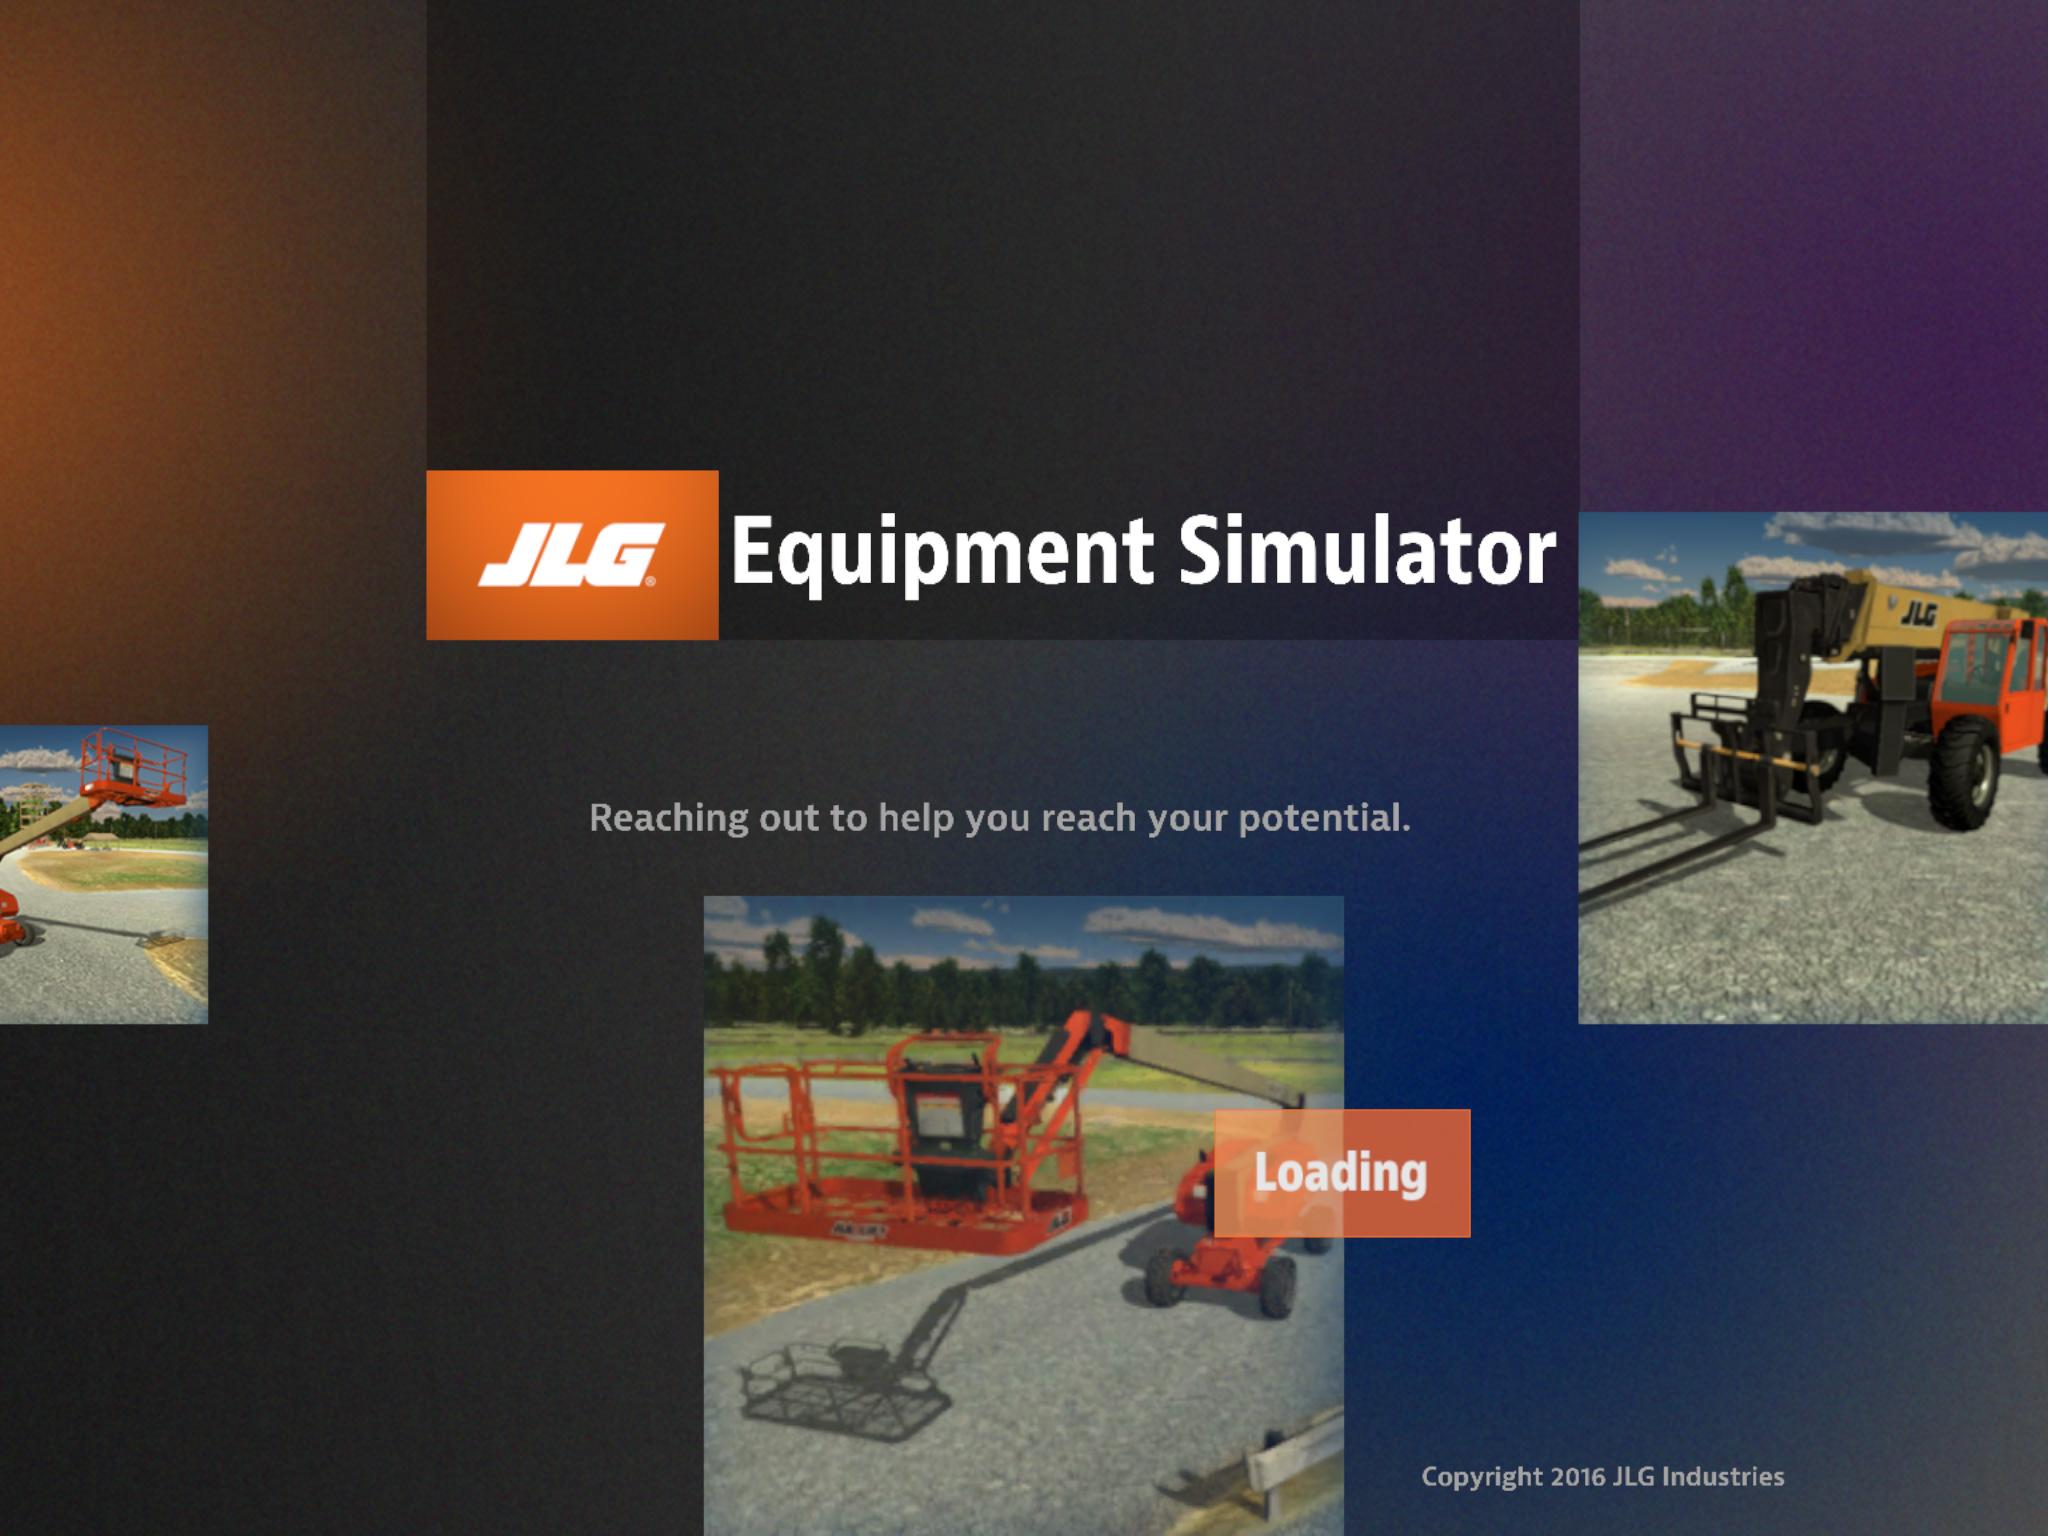 JLG Equipment Simulator by ForgeFX Simulations